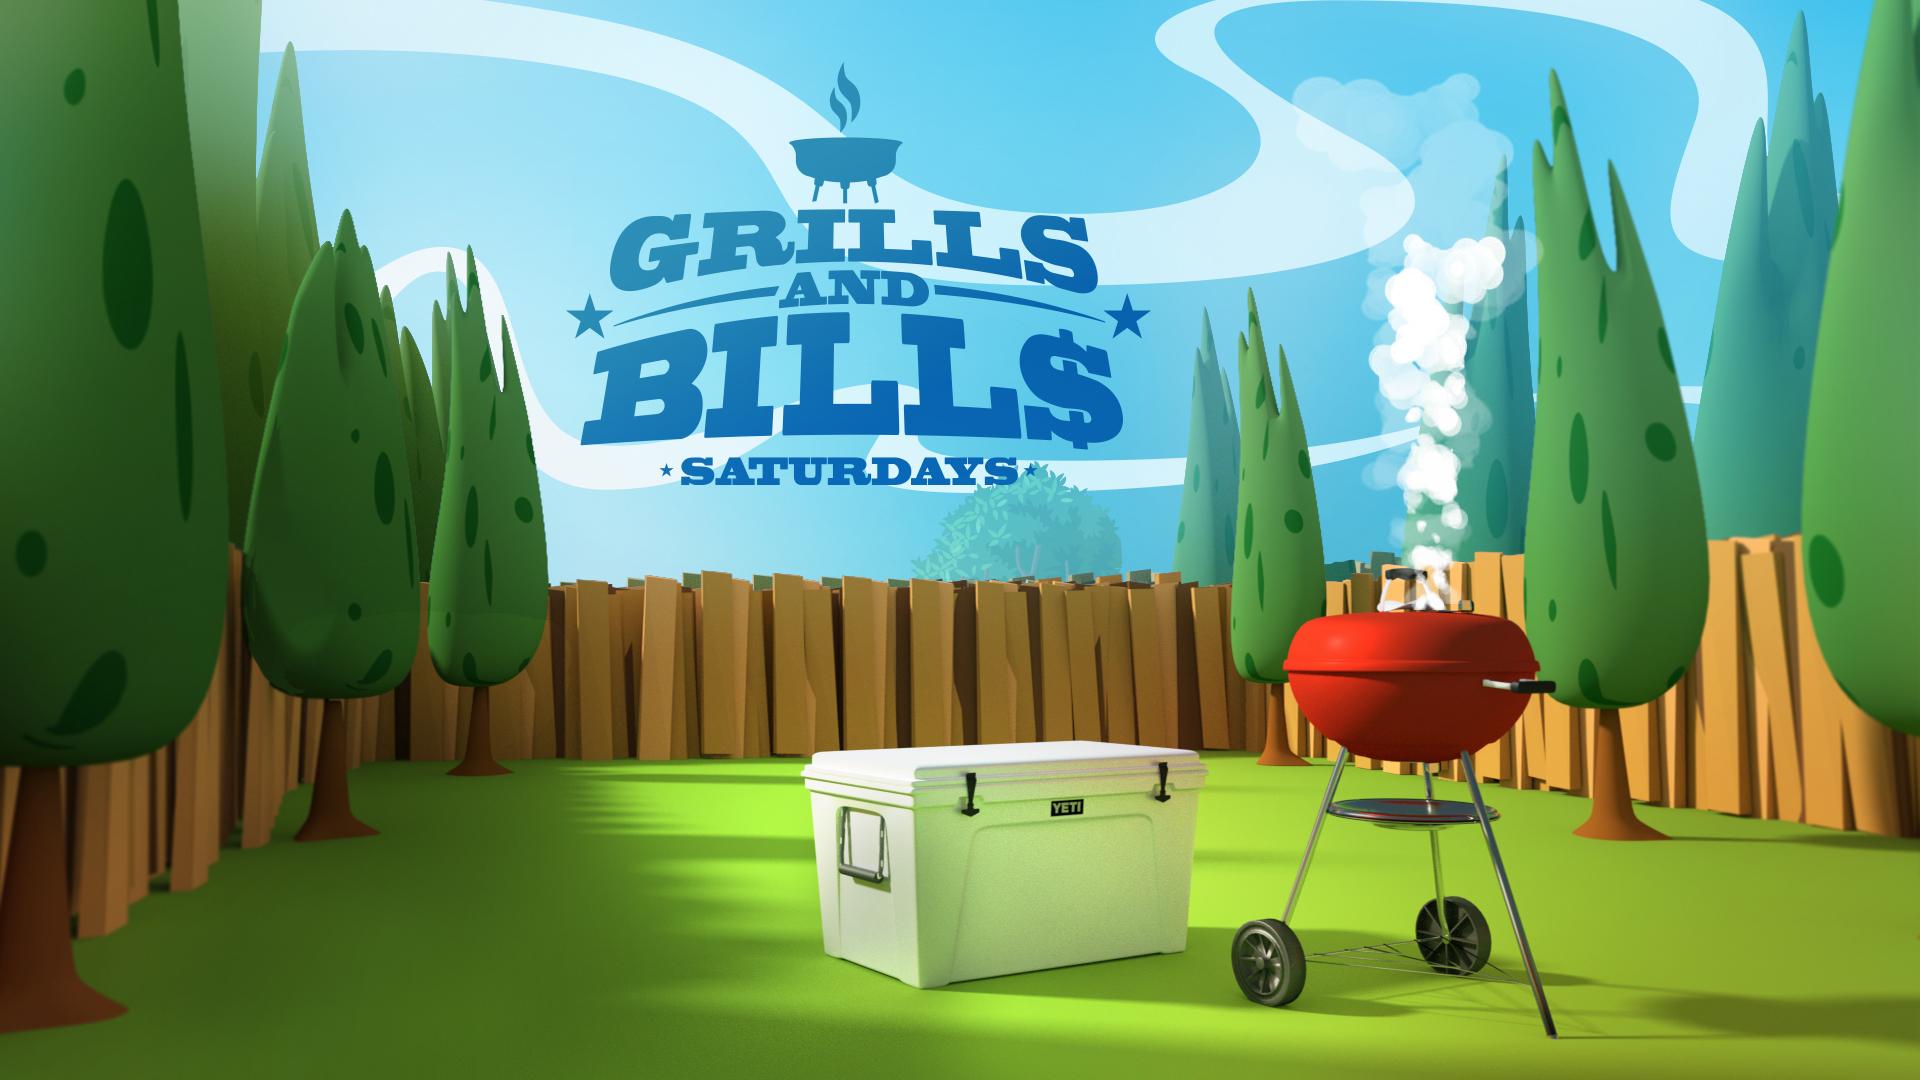 daniel-margiotta-grillsbills-conceptart-06.jpg